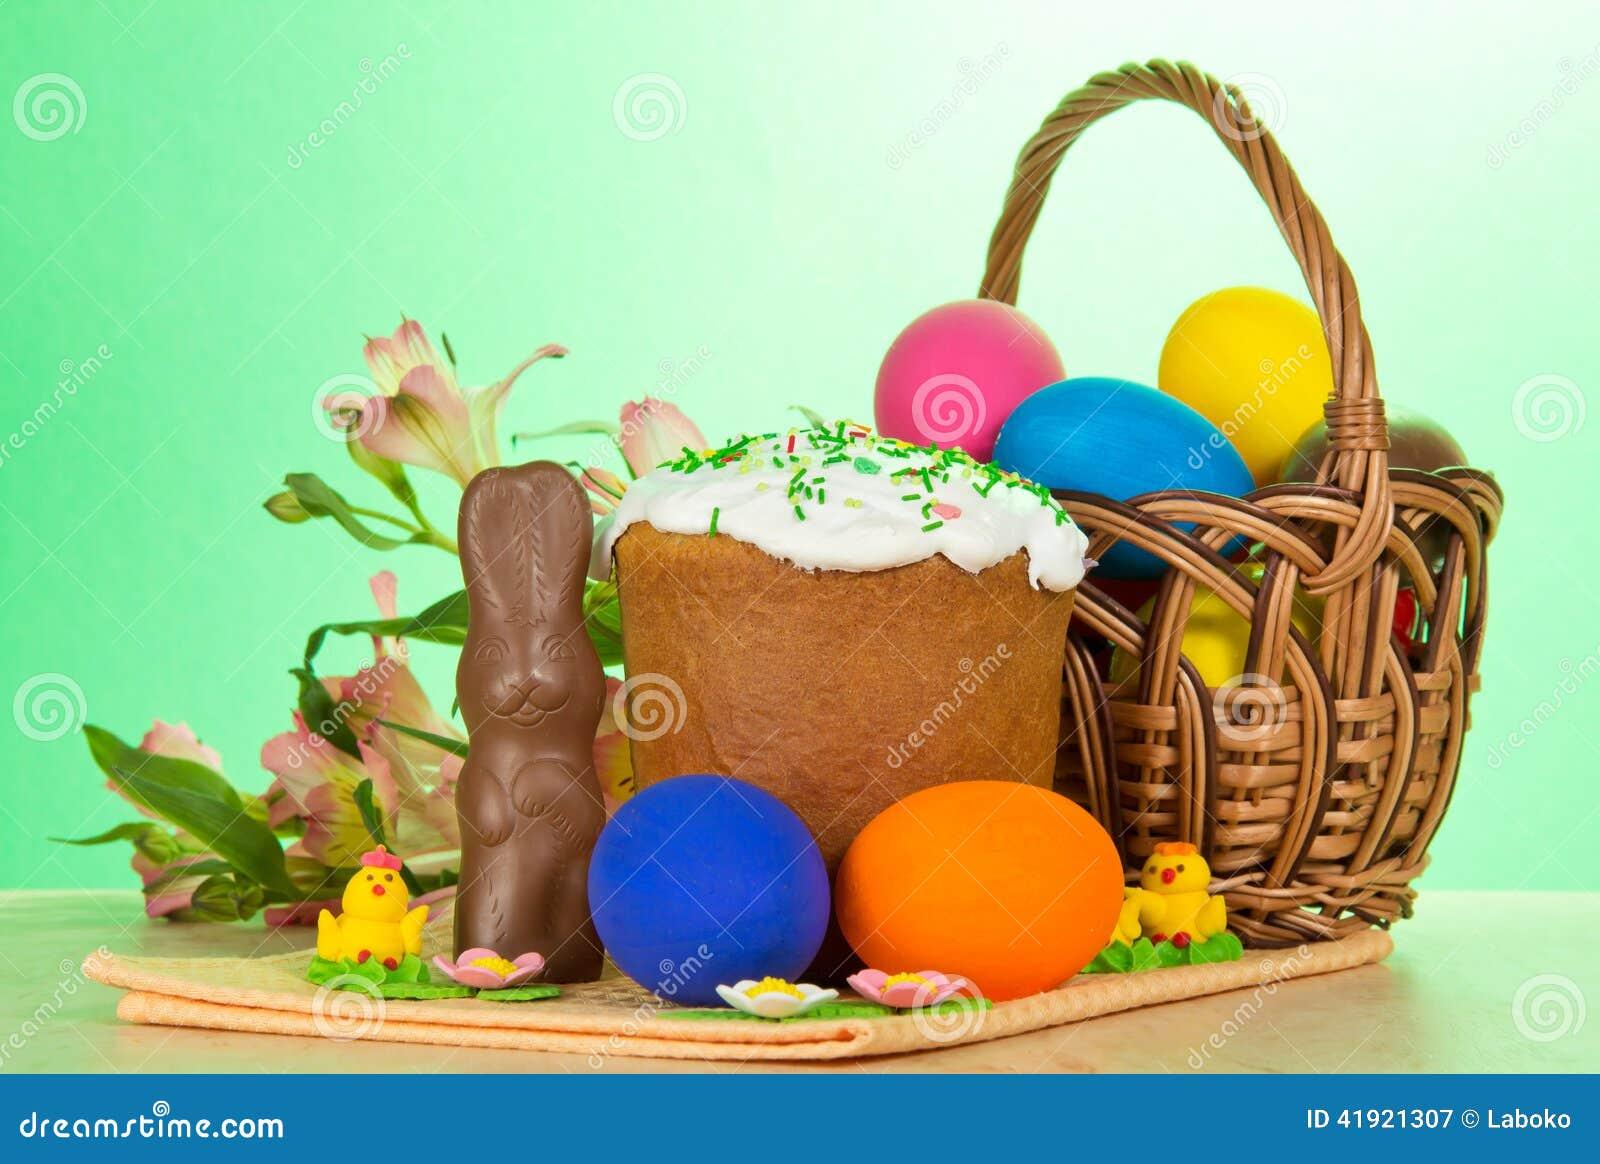 Oeufs, un gâteau de Pâques, lapin et alstromeria